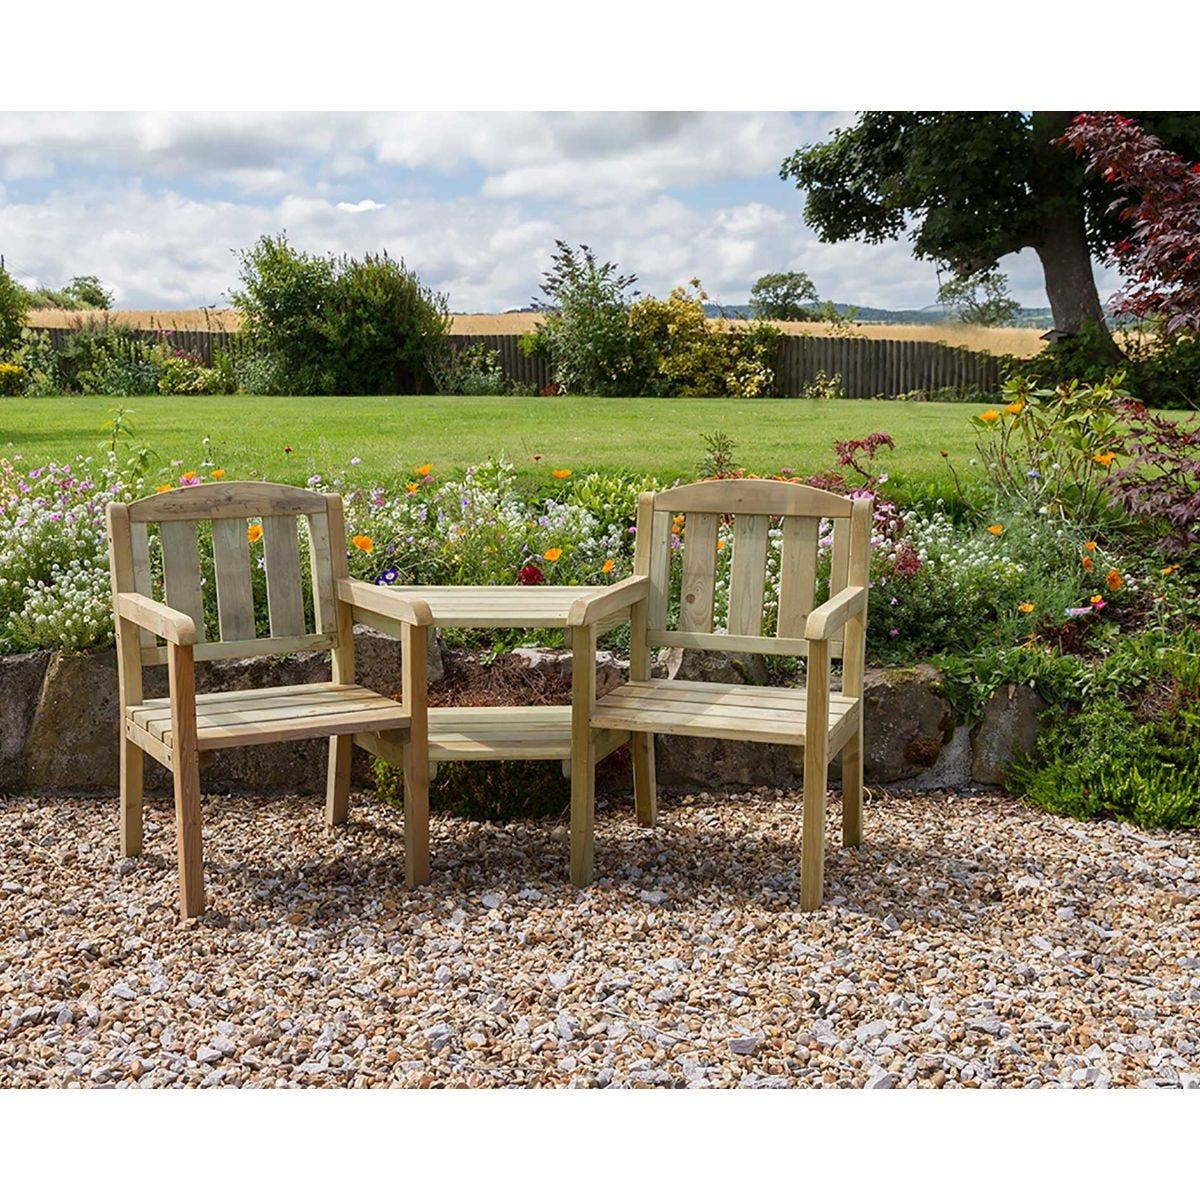 Caroline Companion Garden Seat